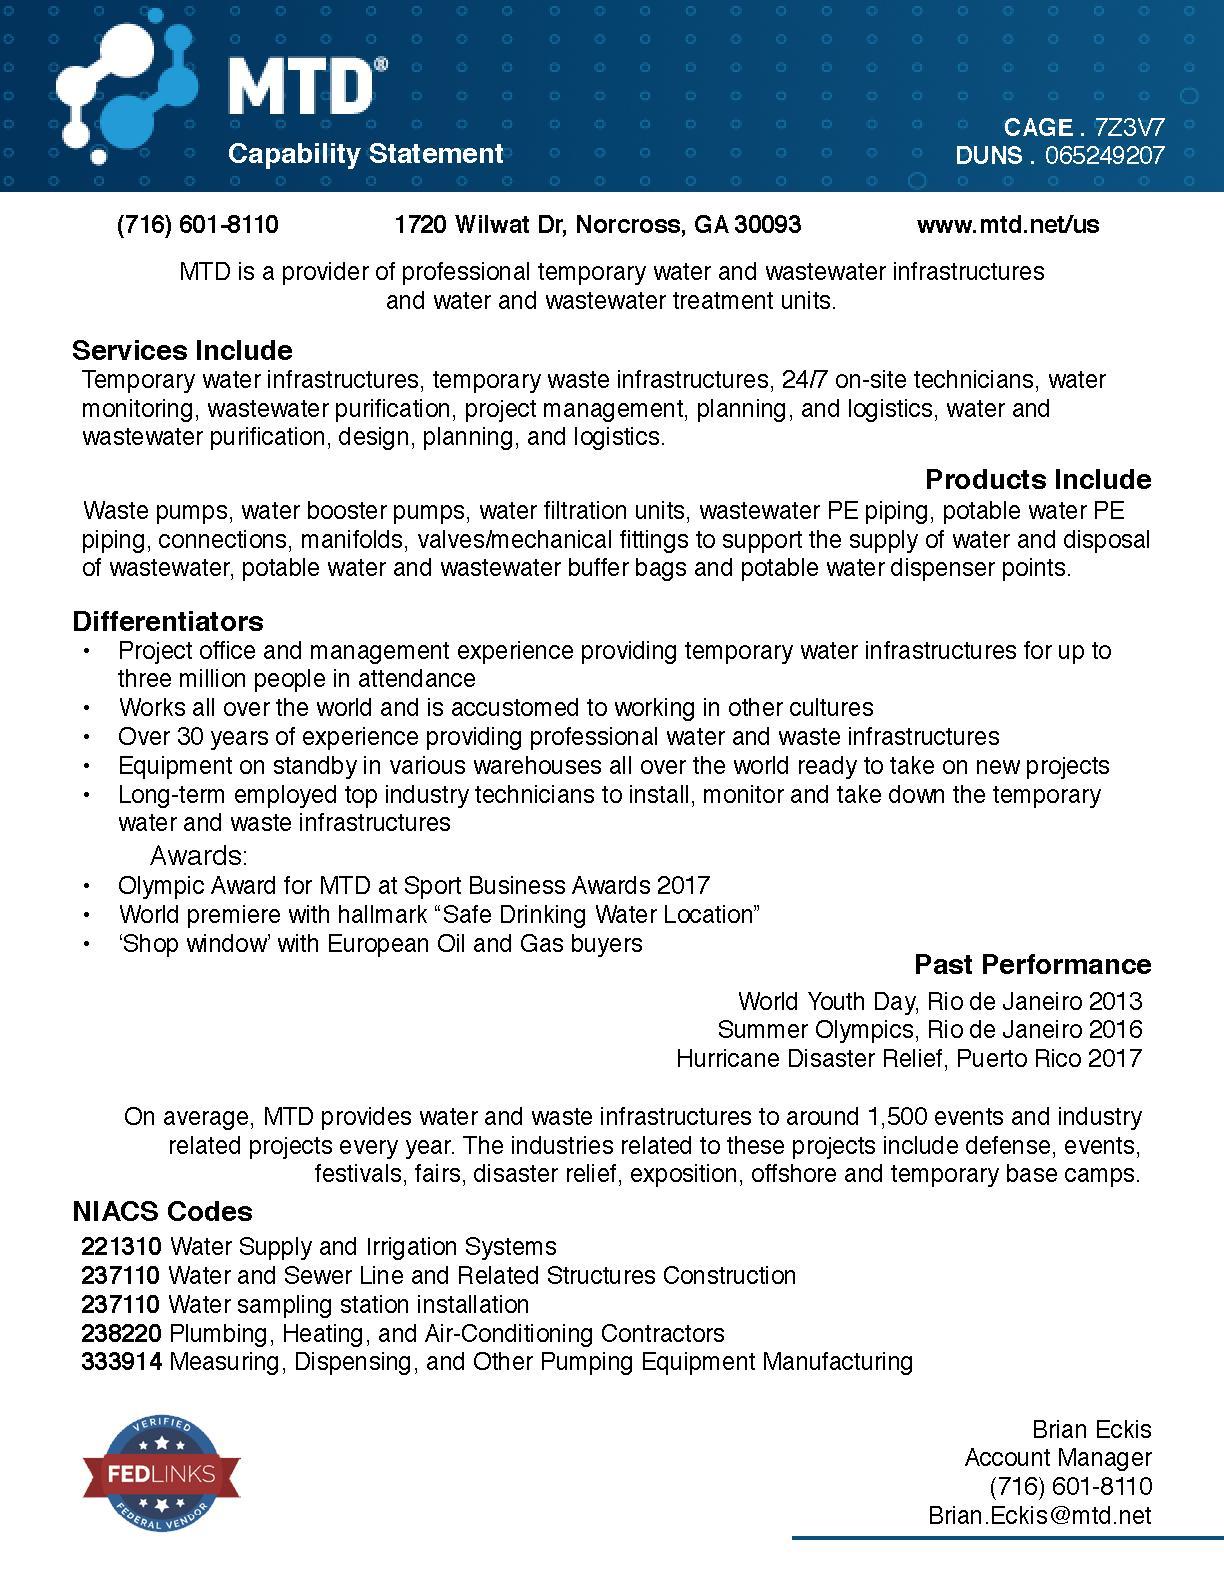 Mtd capability statement